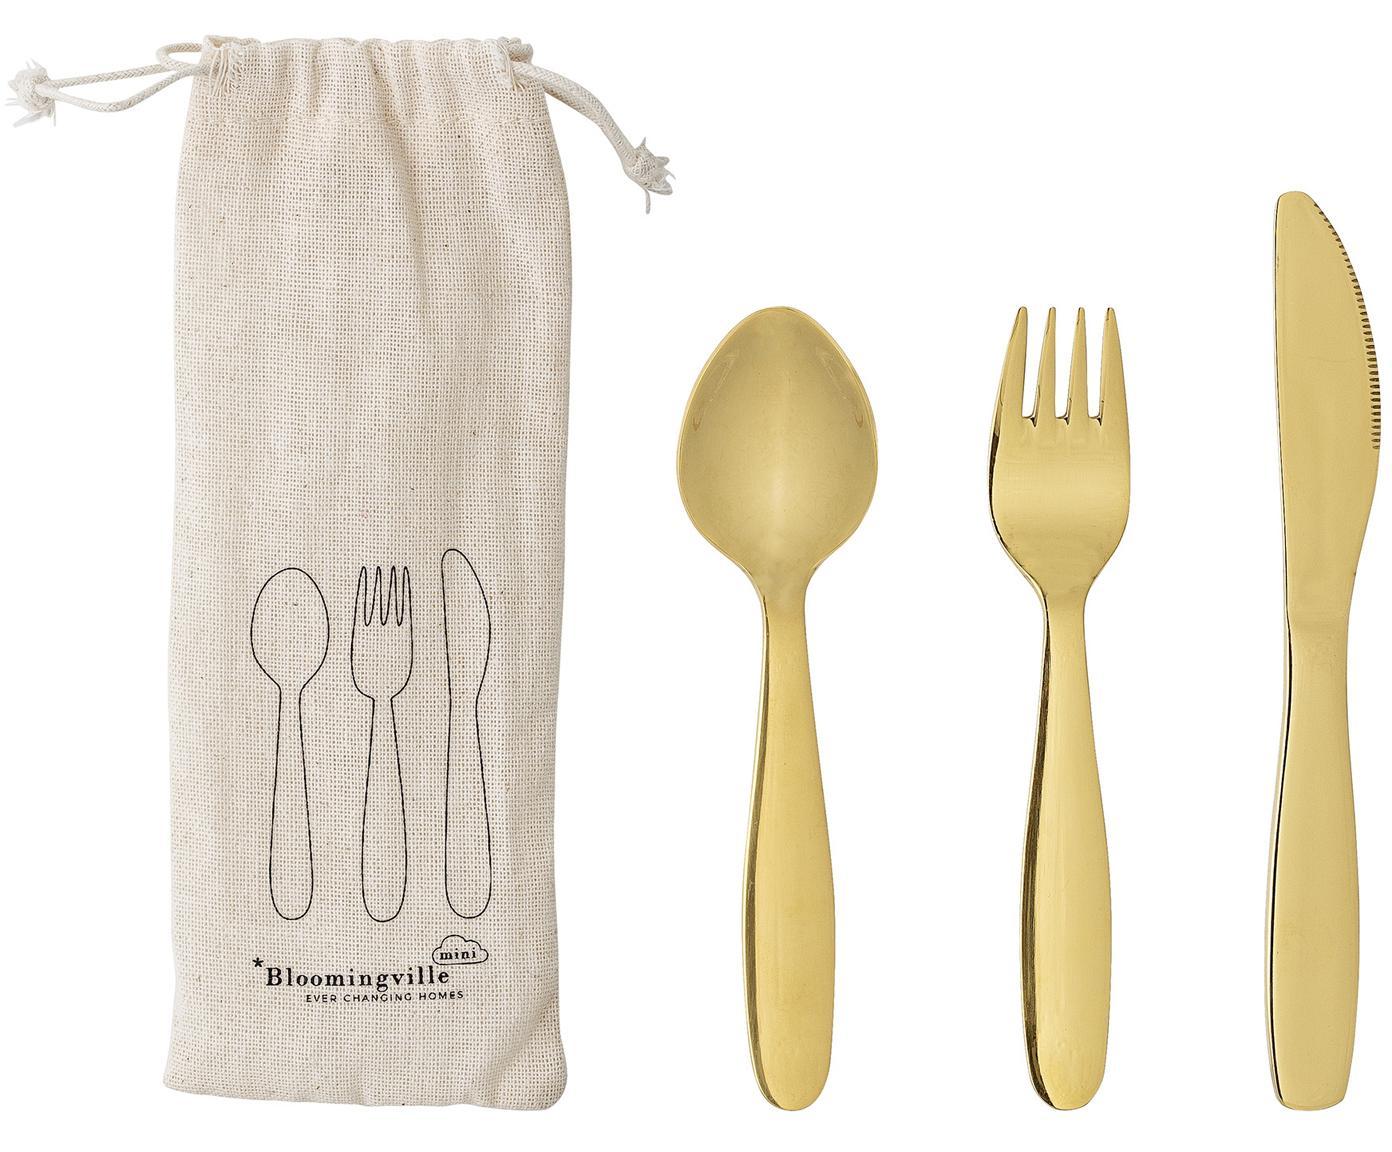 Besteck-Set Kamila, 3-tlg., Besteck: Edelstahl, Beutel: Textil, Goldfarben, 4 x 17 cm